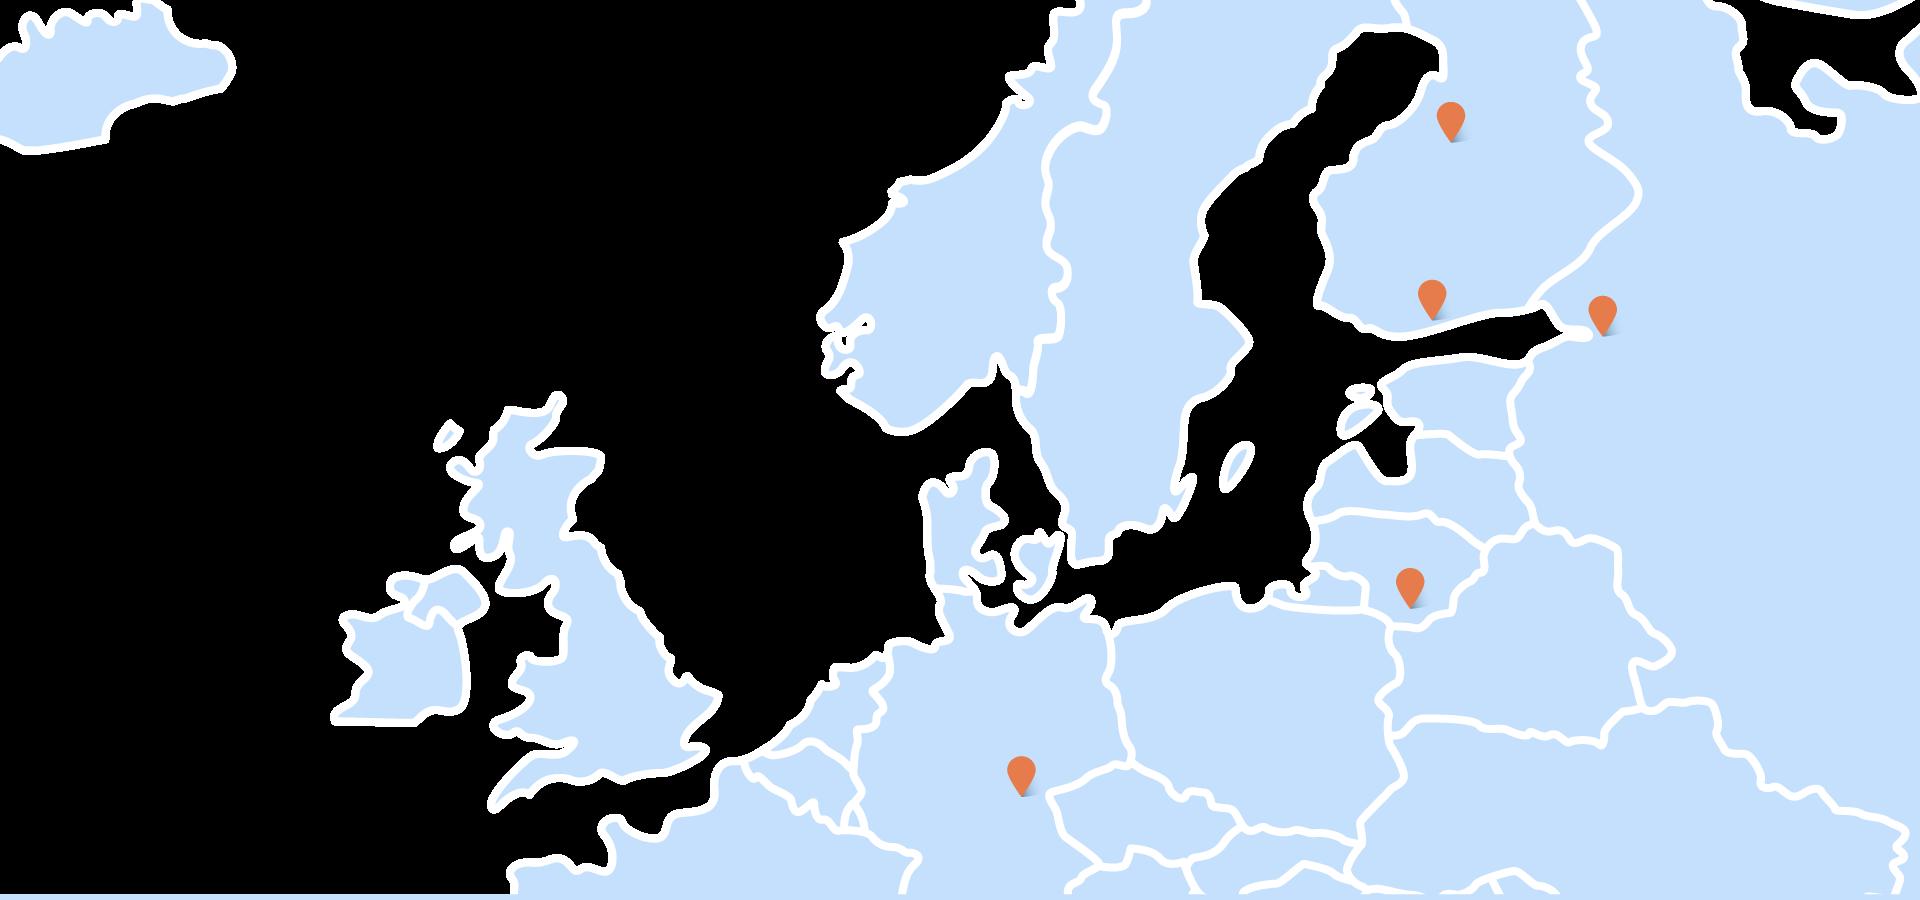 m-filter-map_FI_v1